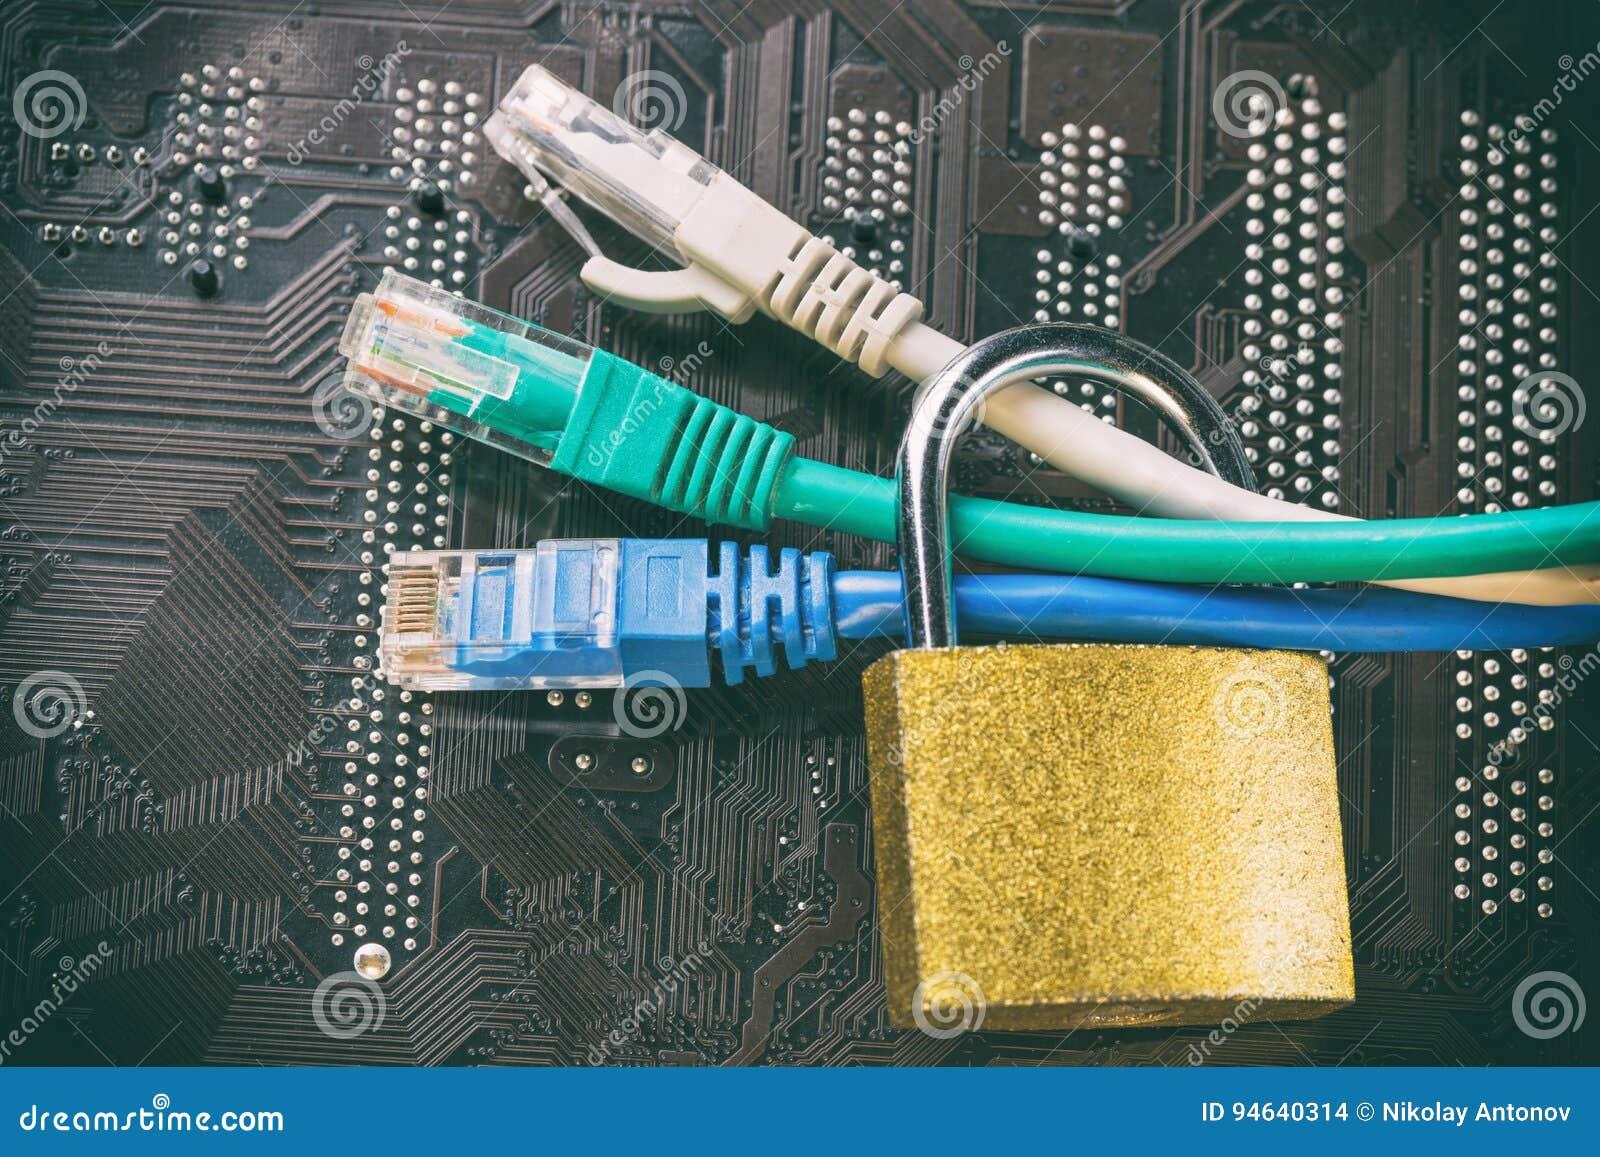 Ethernet Kabel Stock Images - 2,944 Photos